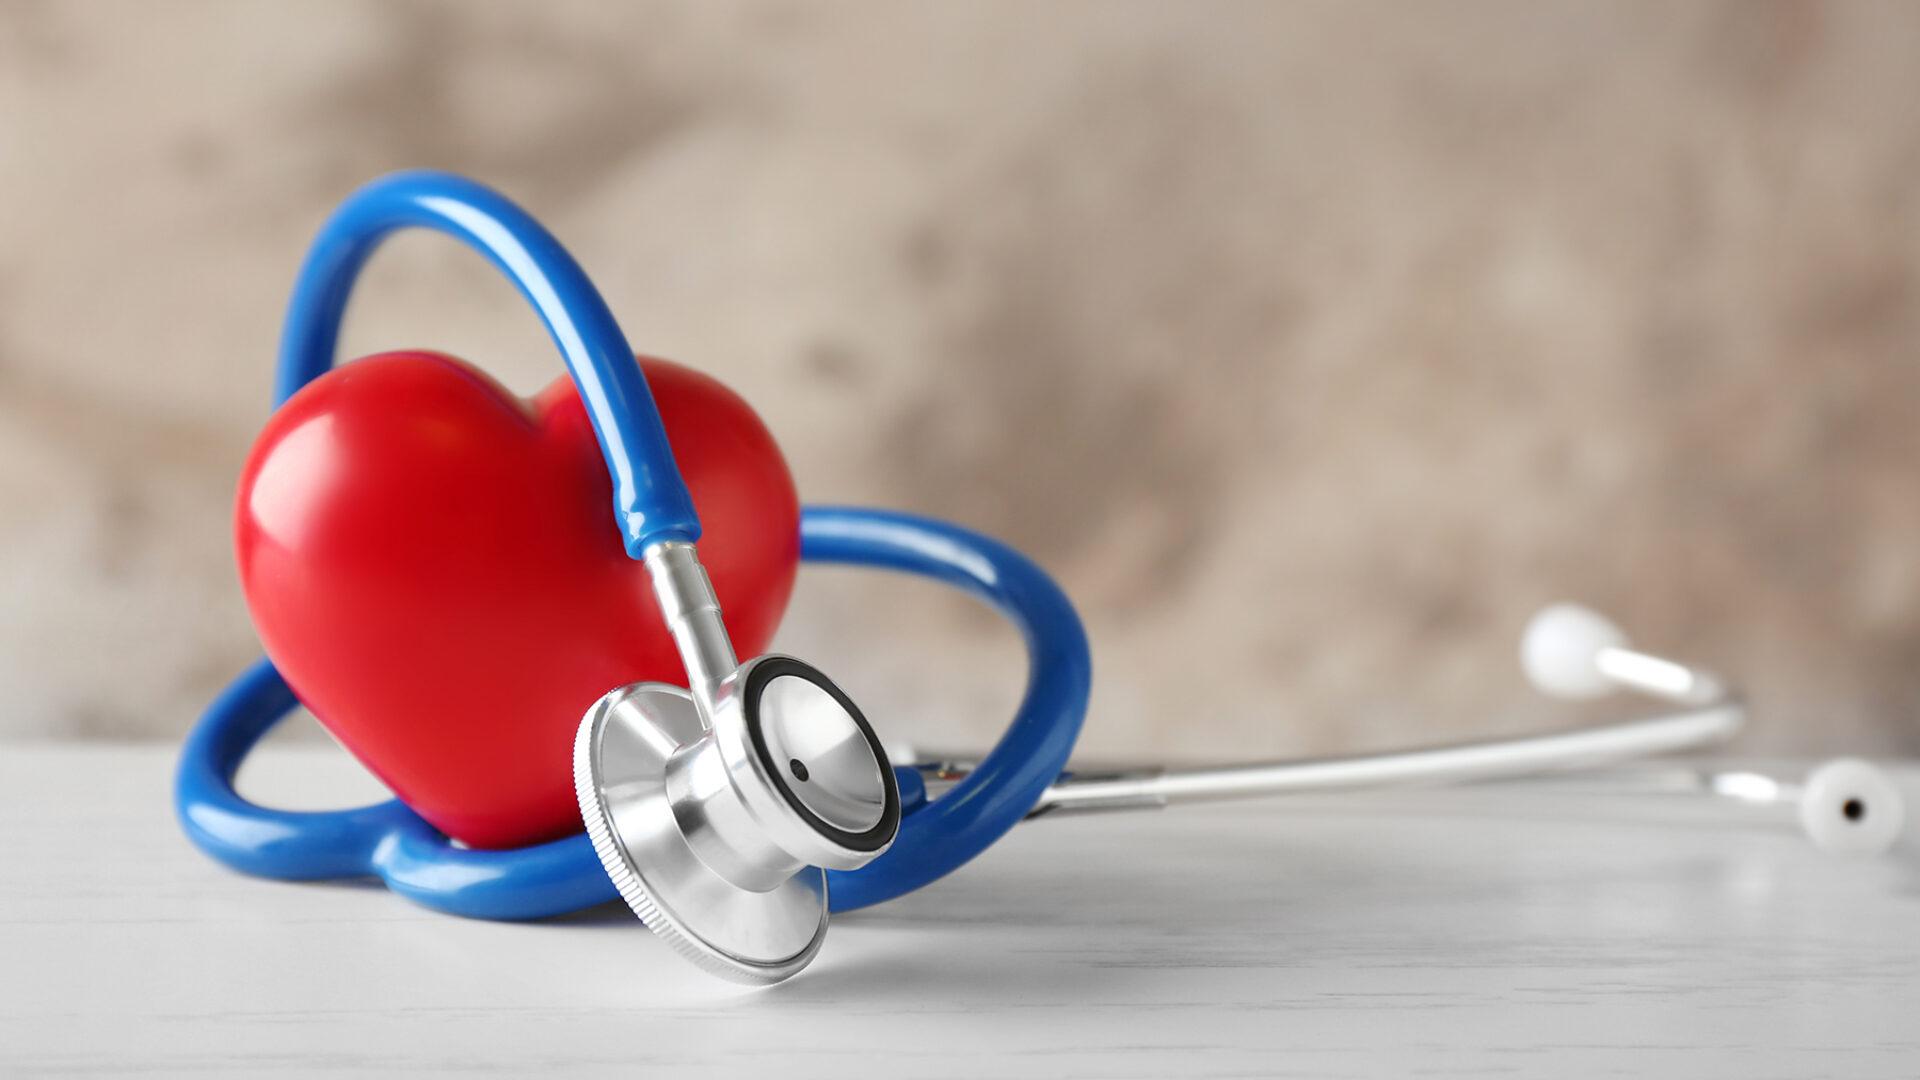 Kronični netransparentitis u zdravstvu HNŽ-a